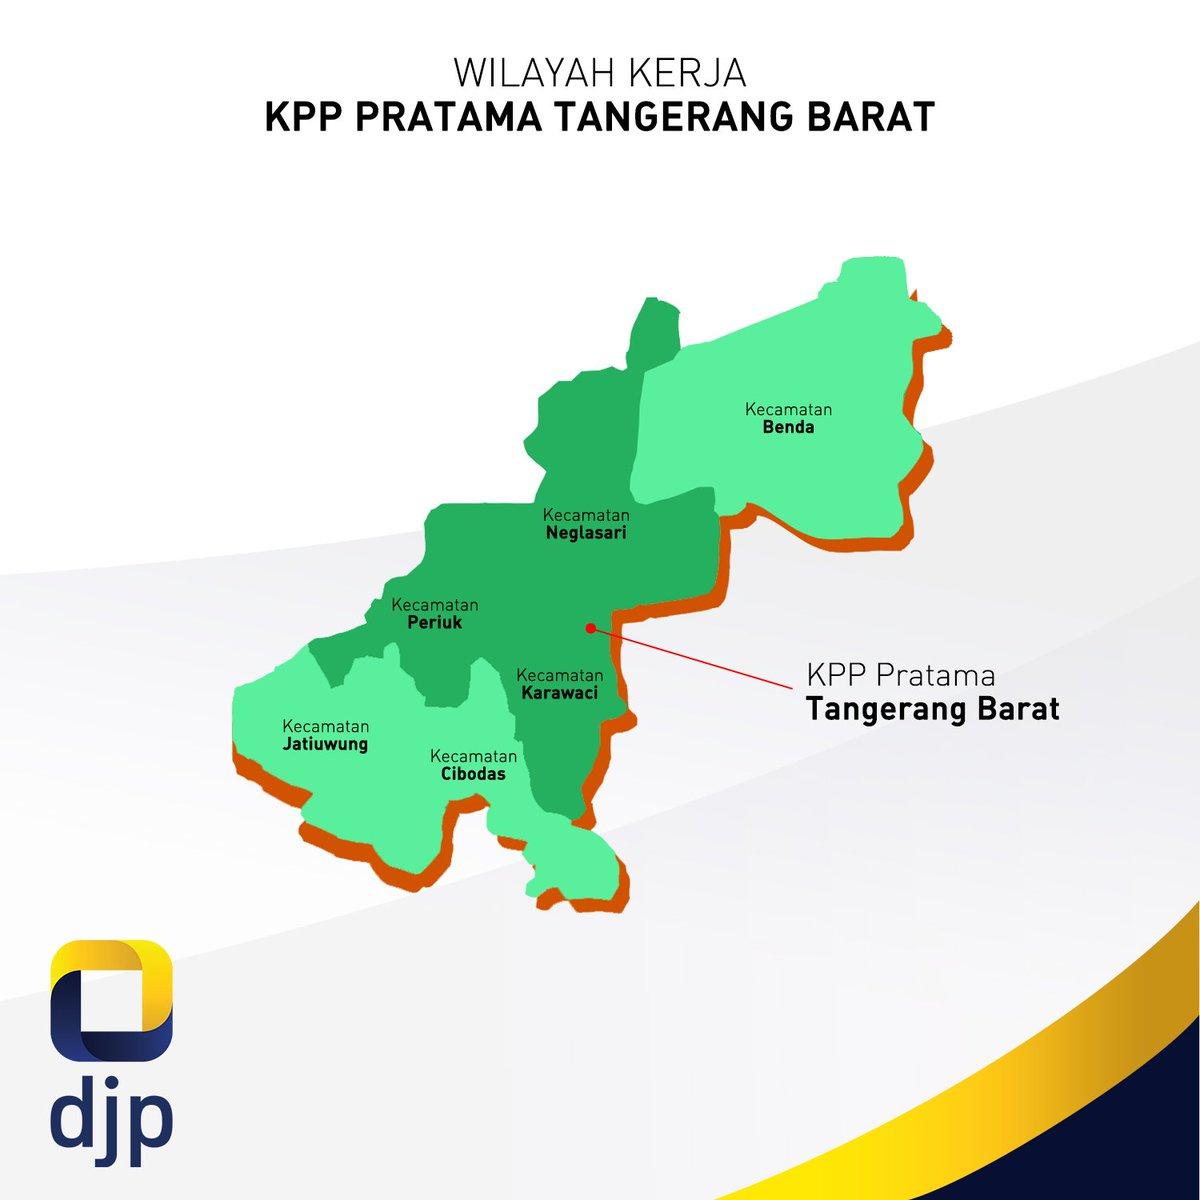 Kanwil DJP Banten's photo on Google Maps